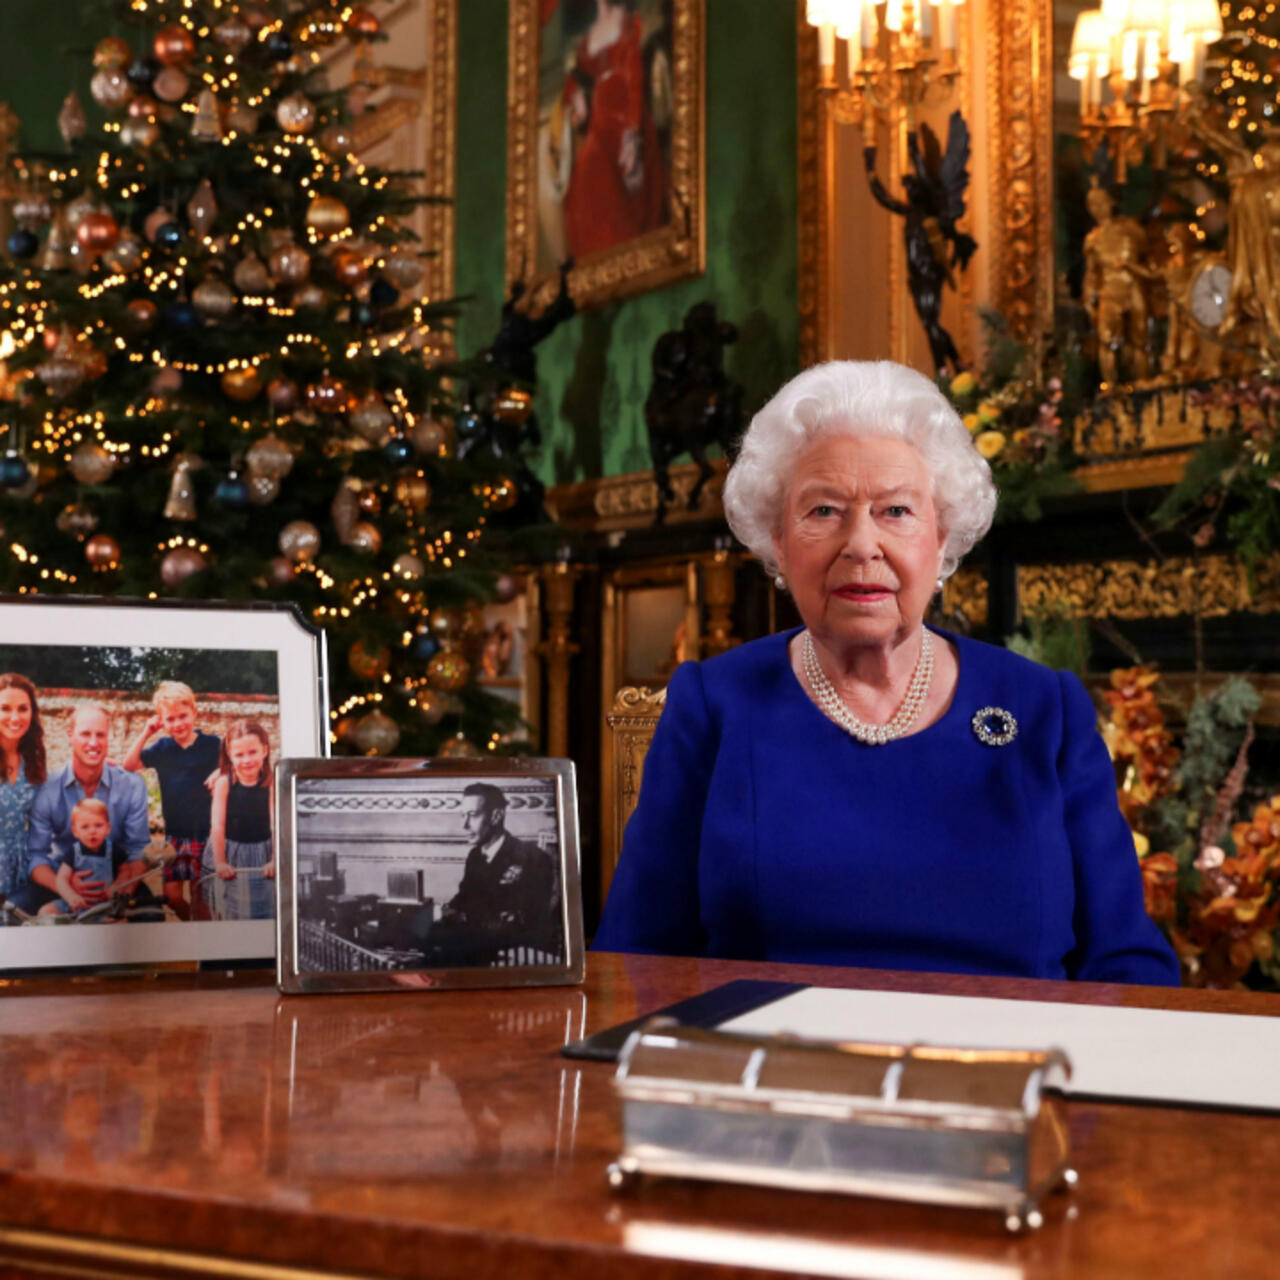 Political Prisoners Christmas 2021 Queen Elizabeth S Christmas Message 2019 Has Been Quite Bumpy